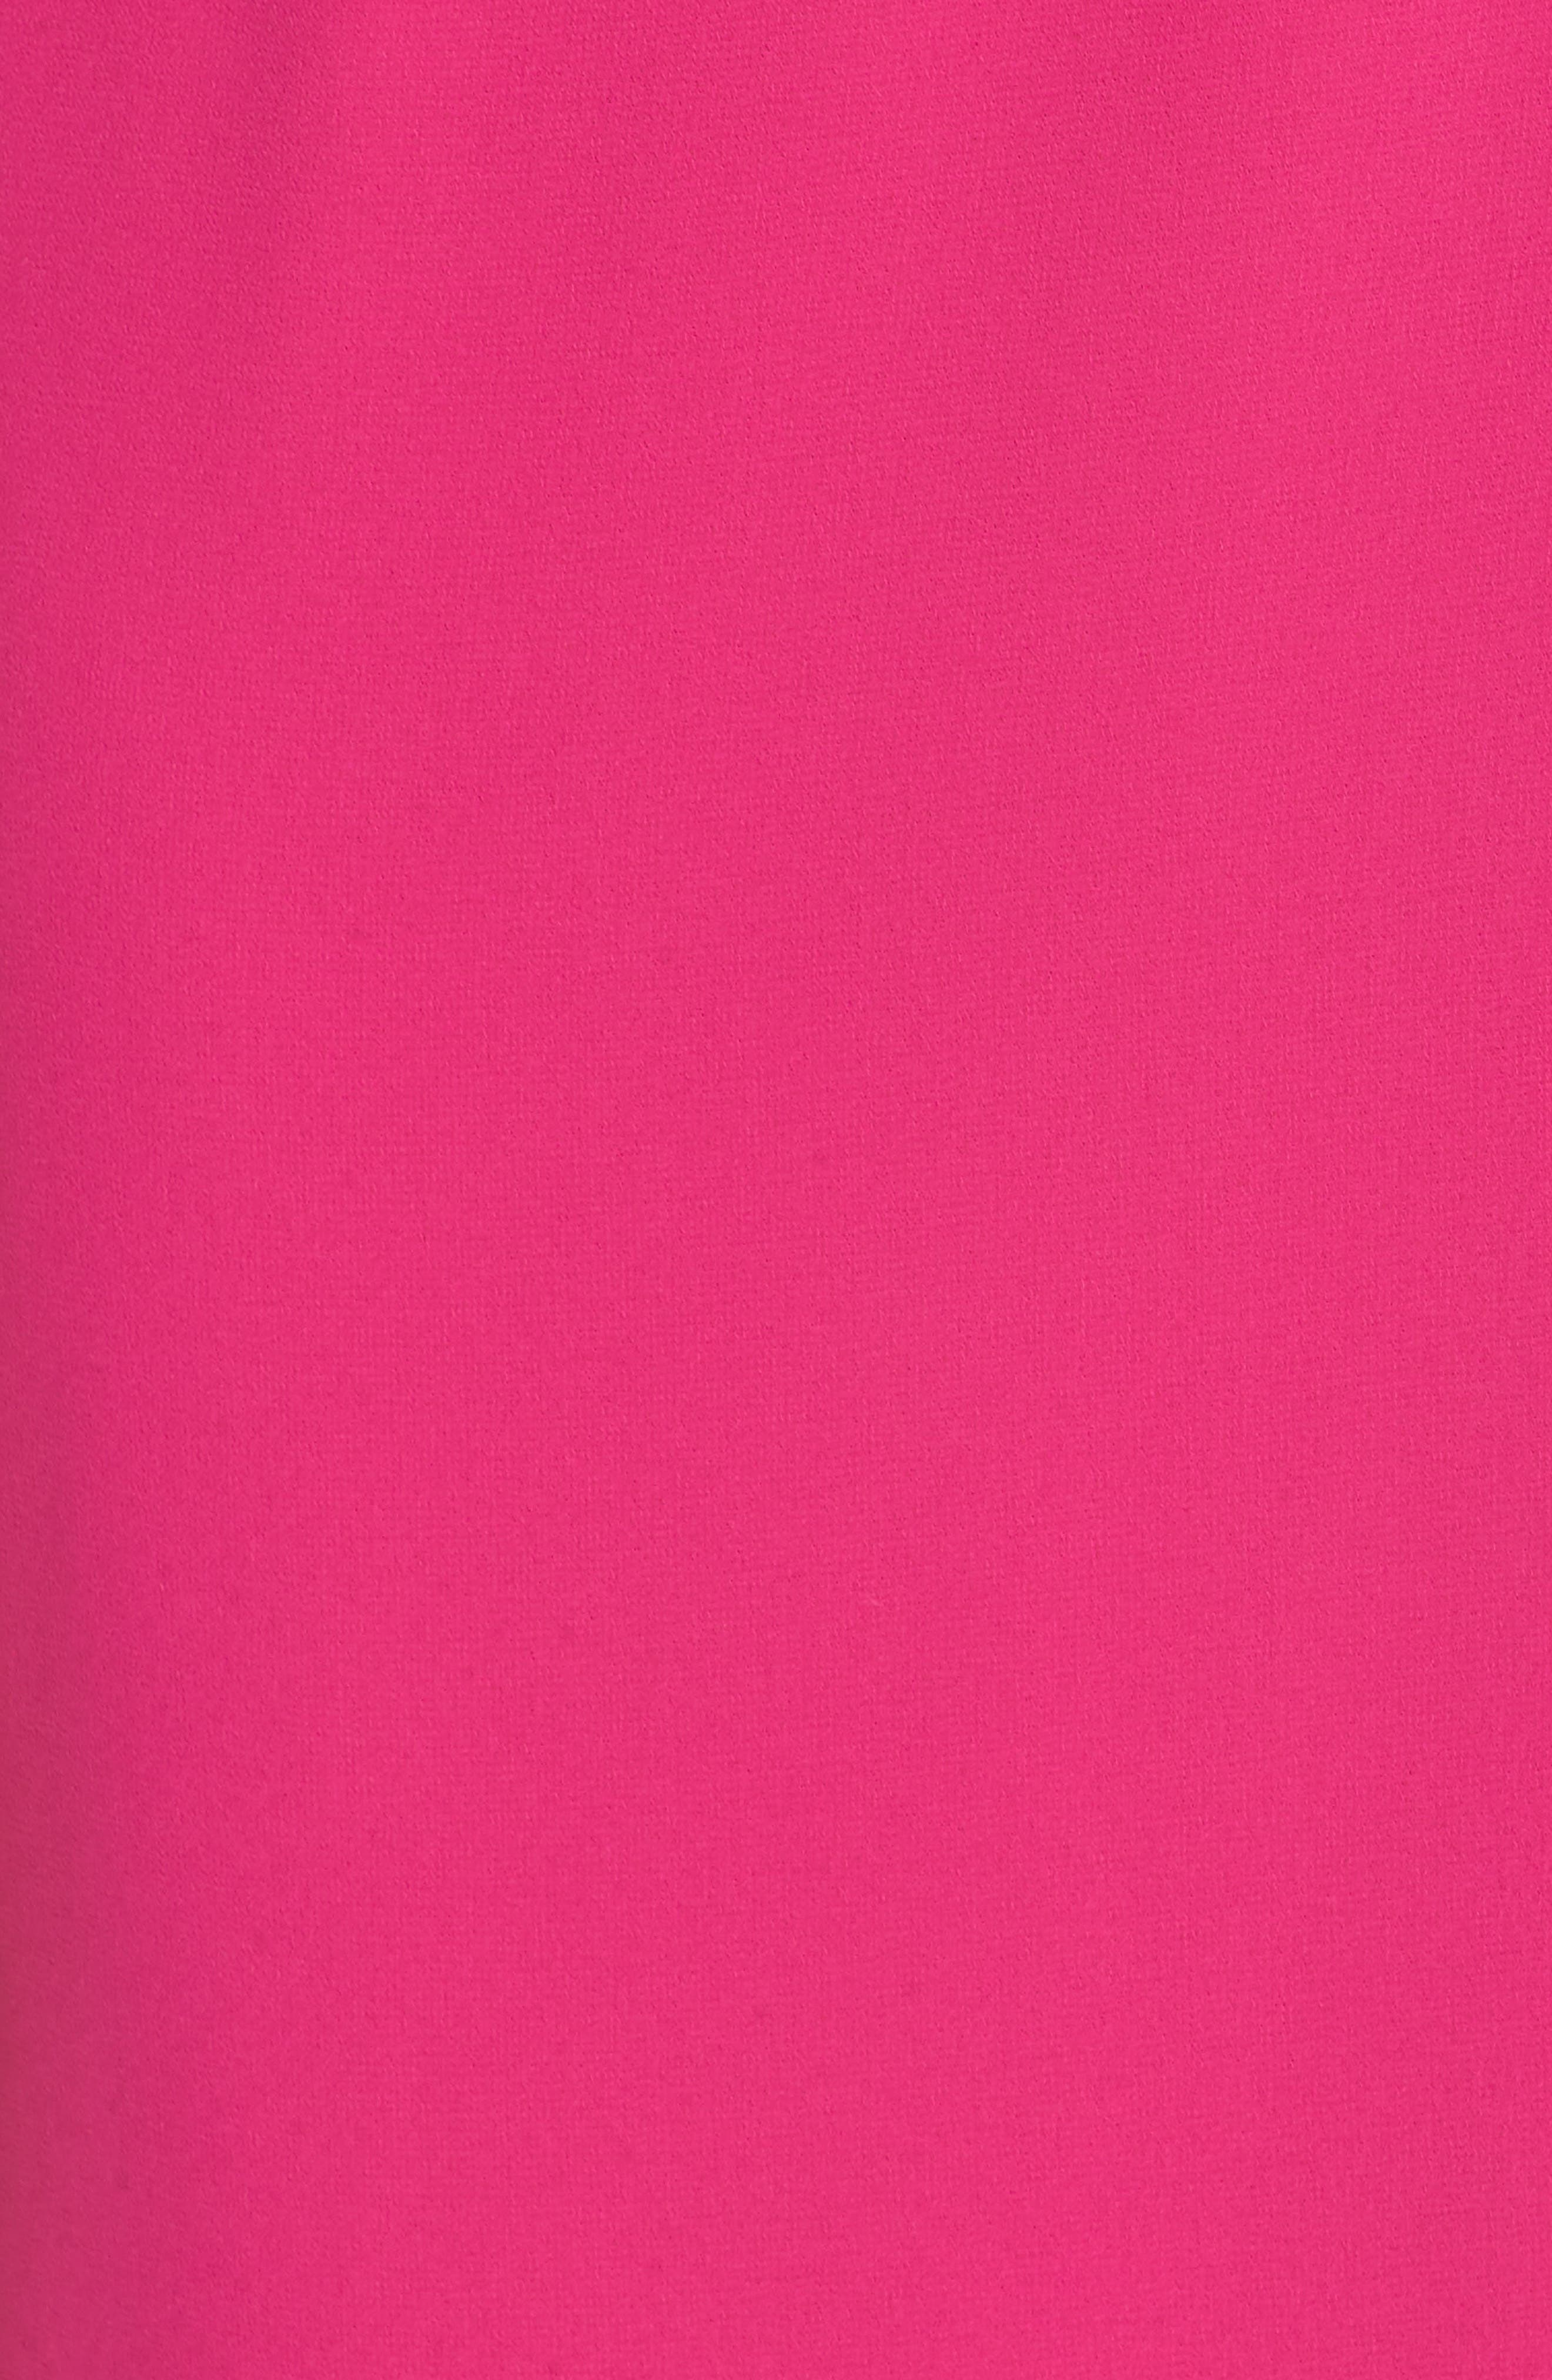 Asymmetrical Ruffle Column Gown,                             Alternate thumbnail 6, color,                             650